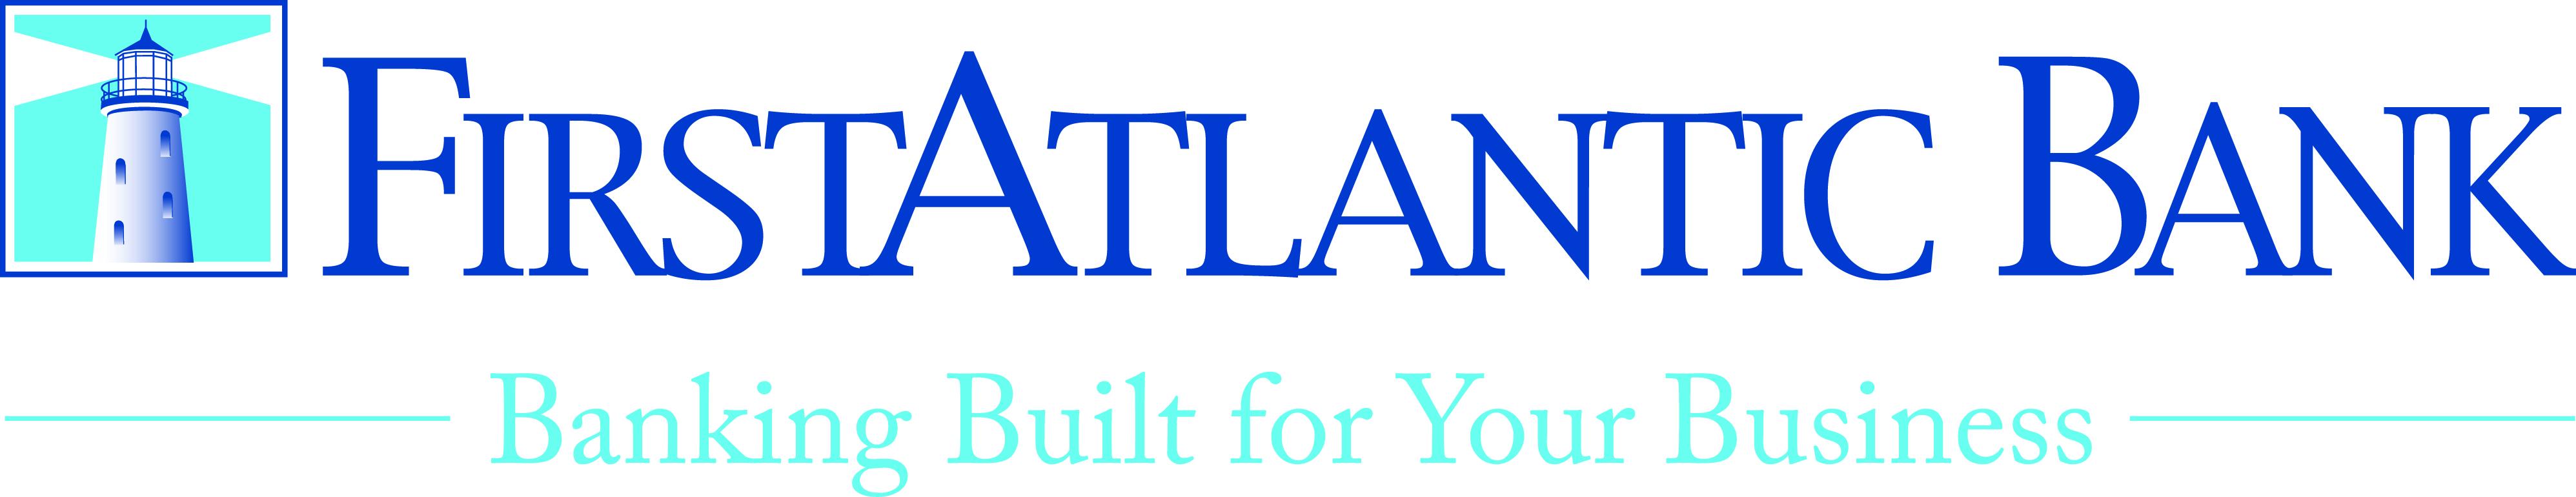 FirstAtlanticBank_horz_tagline.jpg